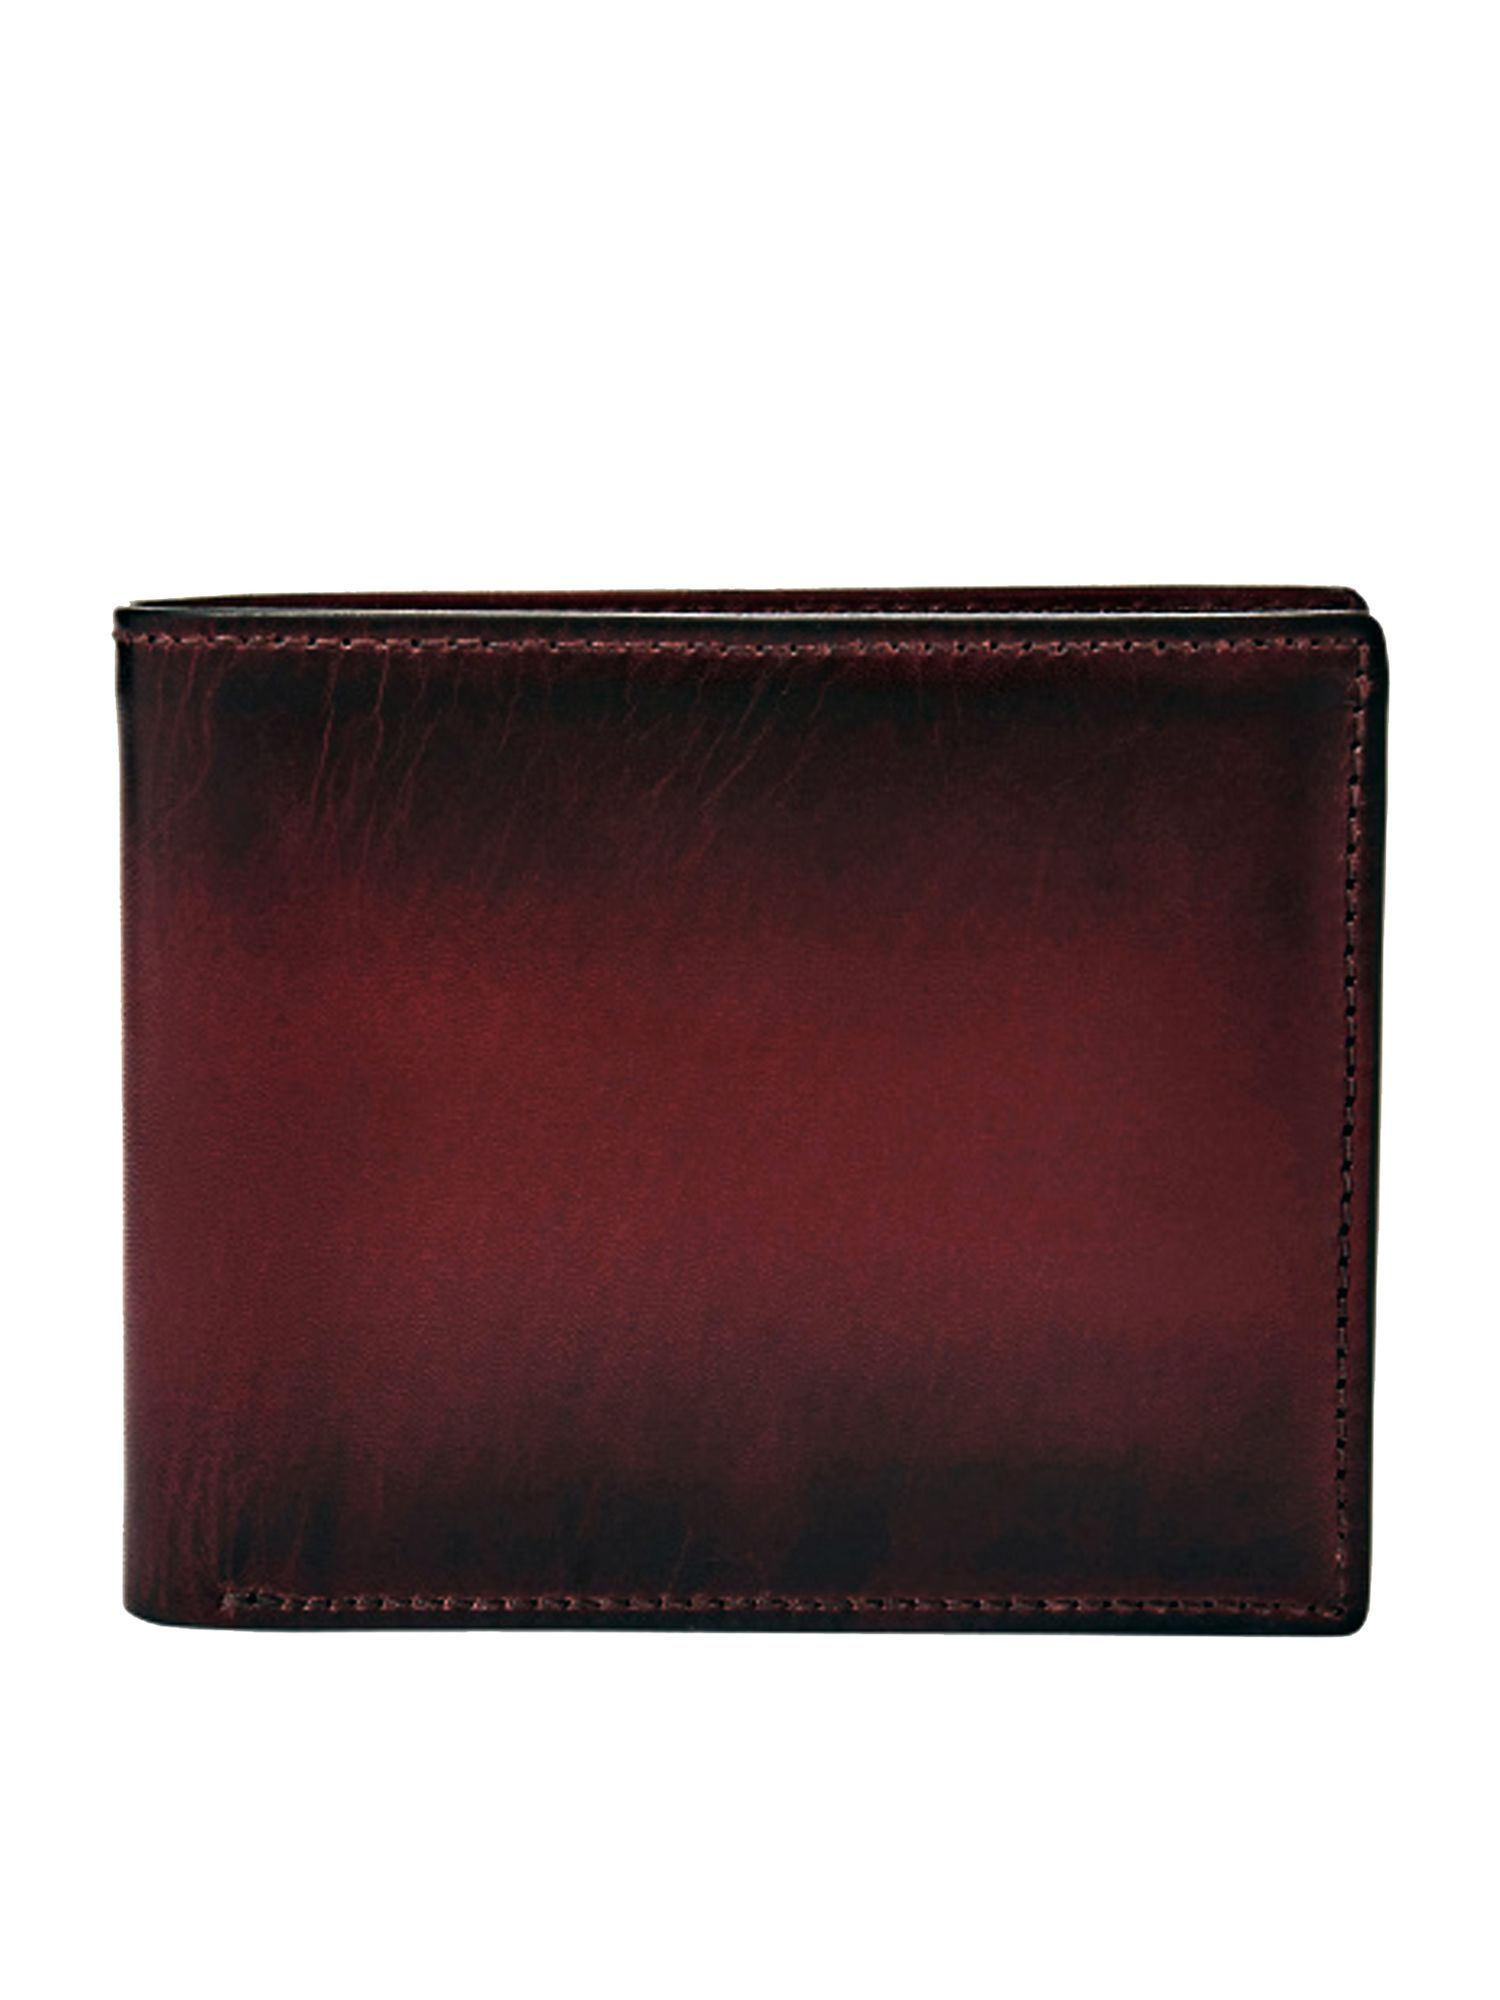 457860b2b6cf2 Fossil Herren Geldbörse PAUL Bifold Leder Rot ML3894-603 - Kaufen ...